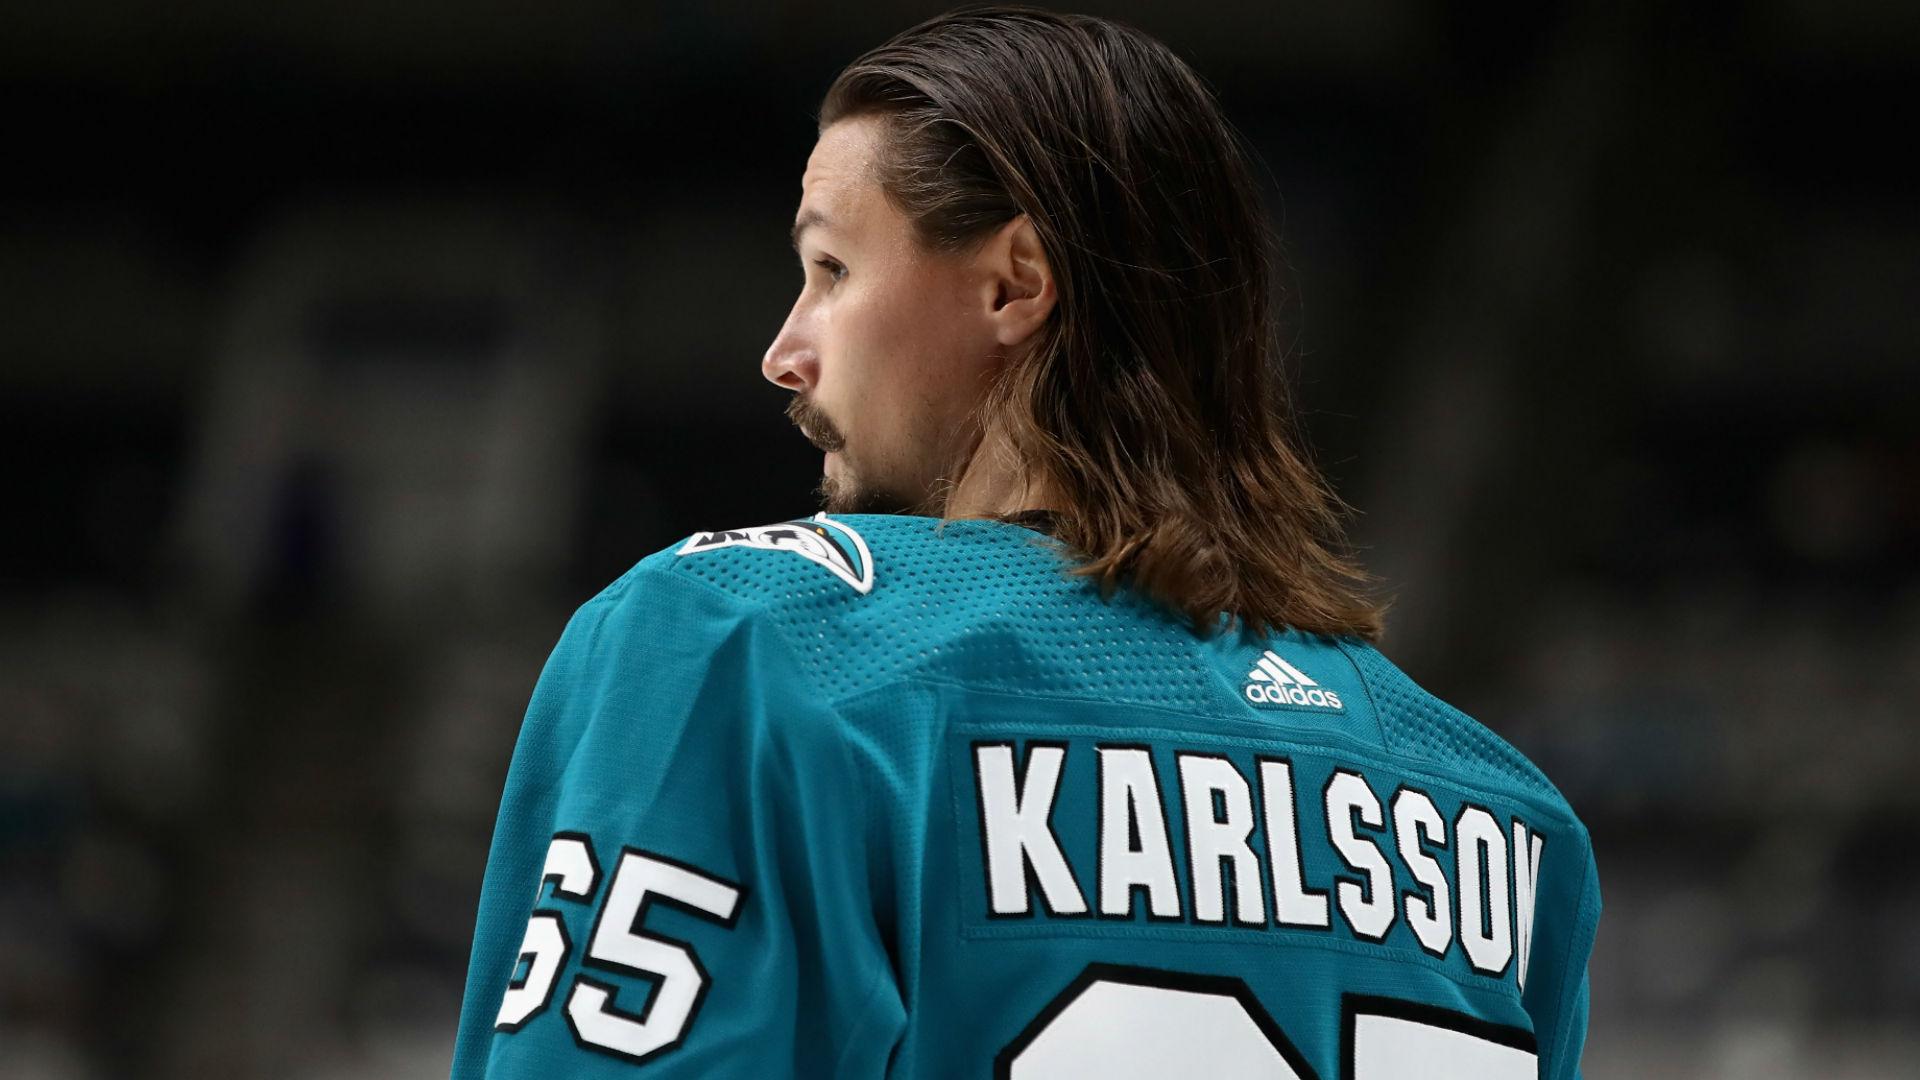 Sharks Erik Karlsson has no regrets ahead of emotional return to 1920x1080